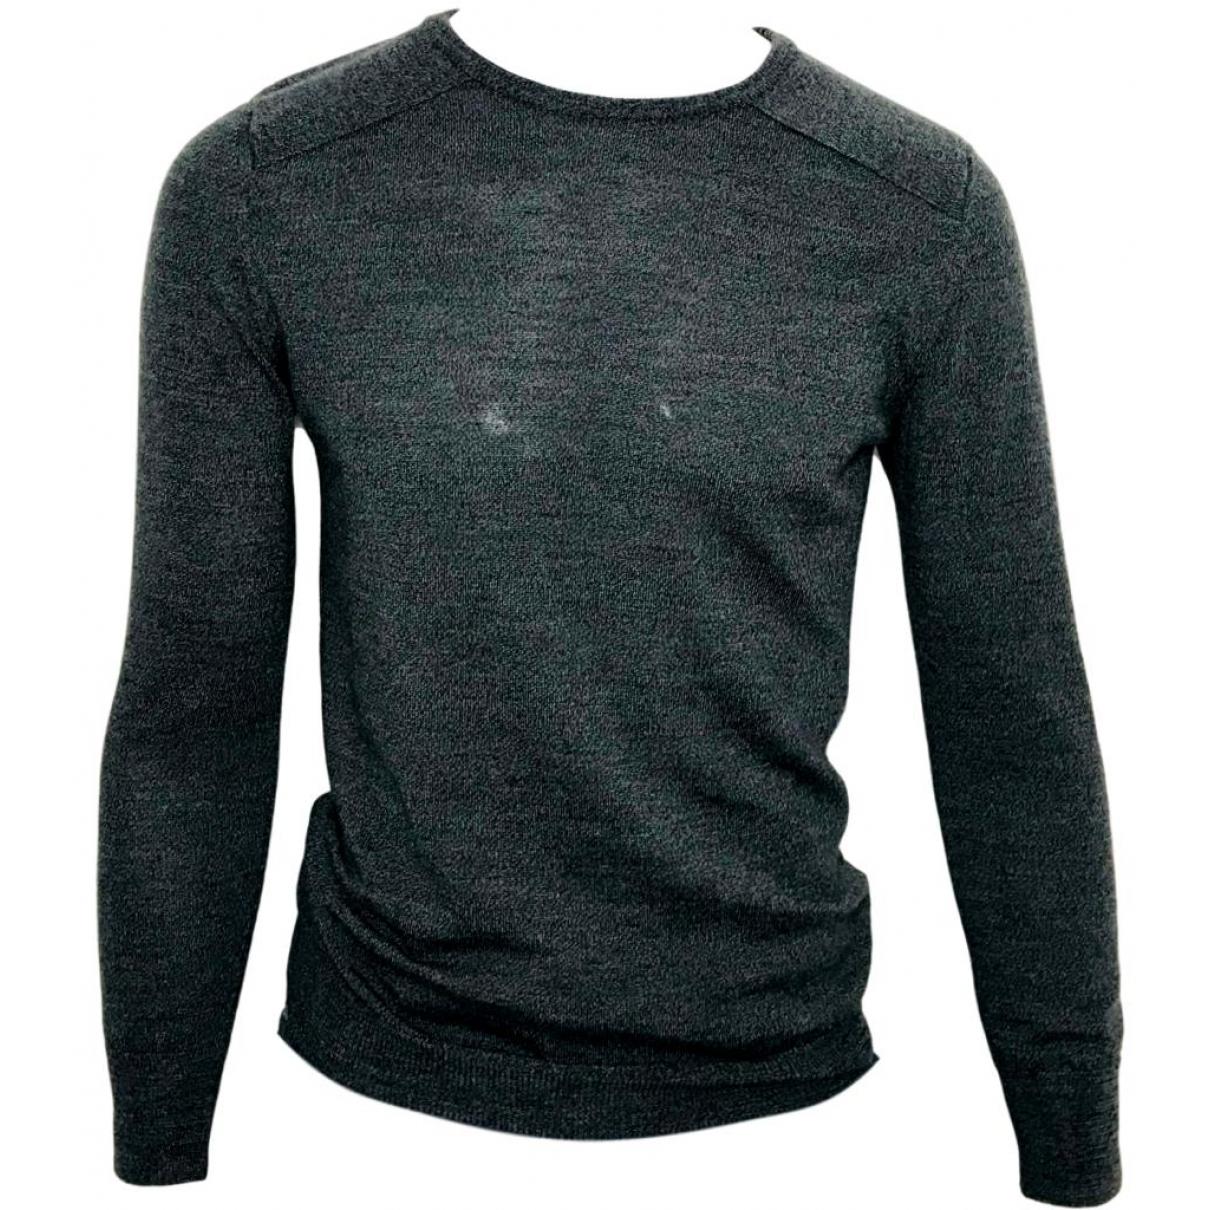 Oliver Spencer \N Grey Wool Knitwear & Sweatshirts for Men S International